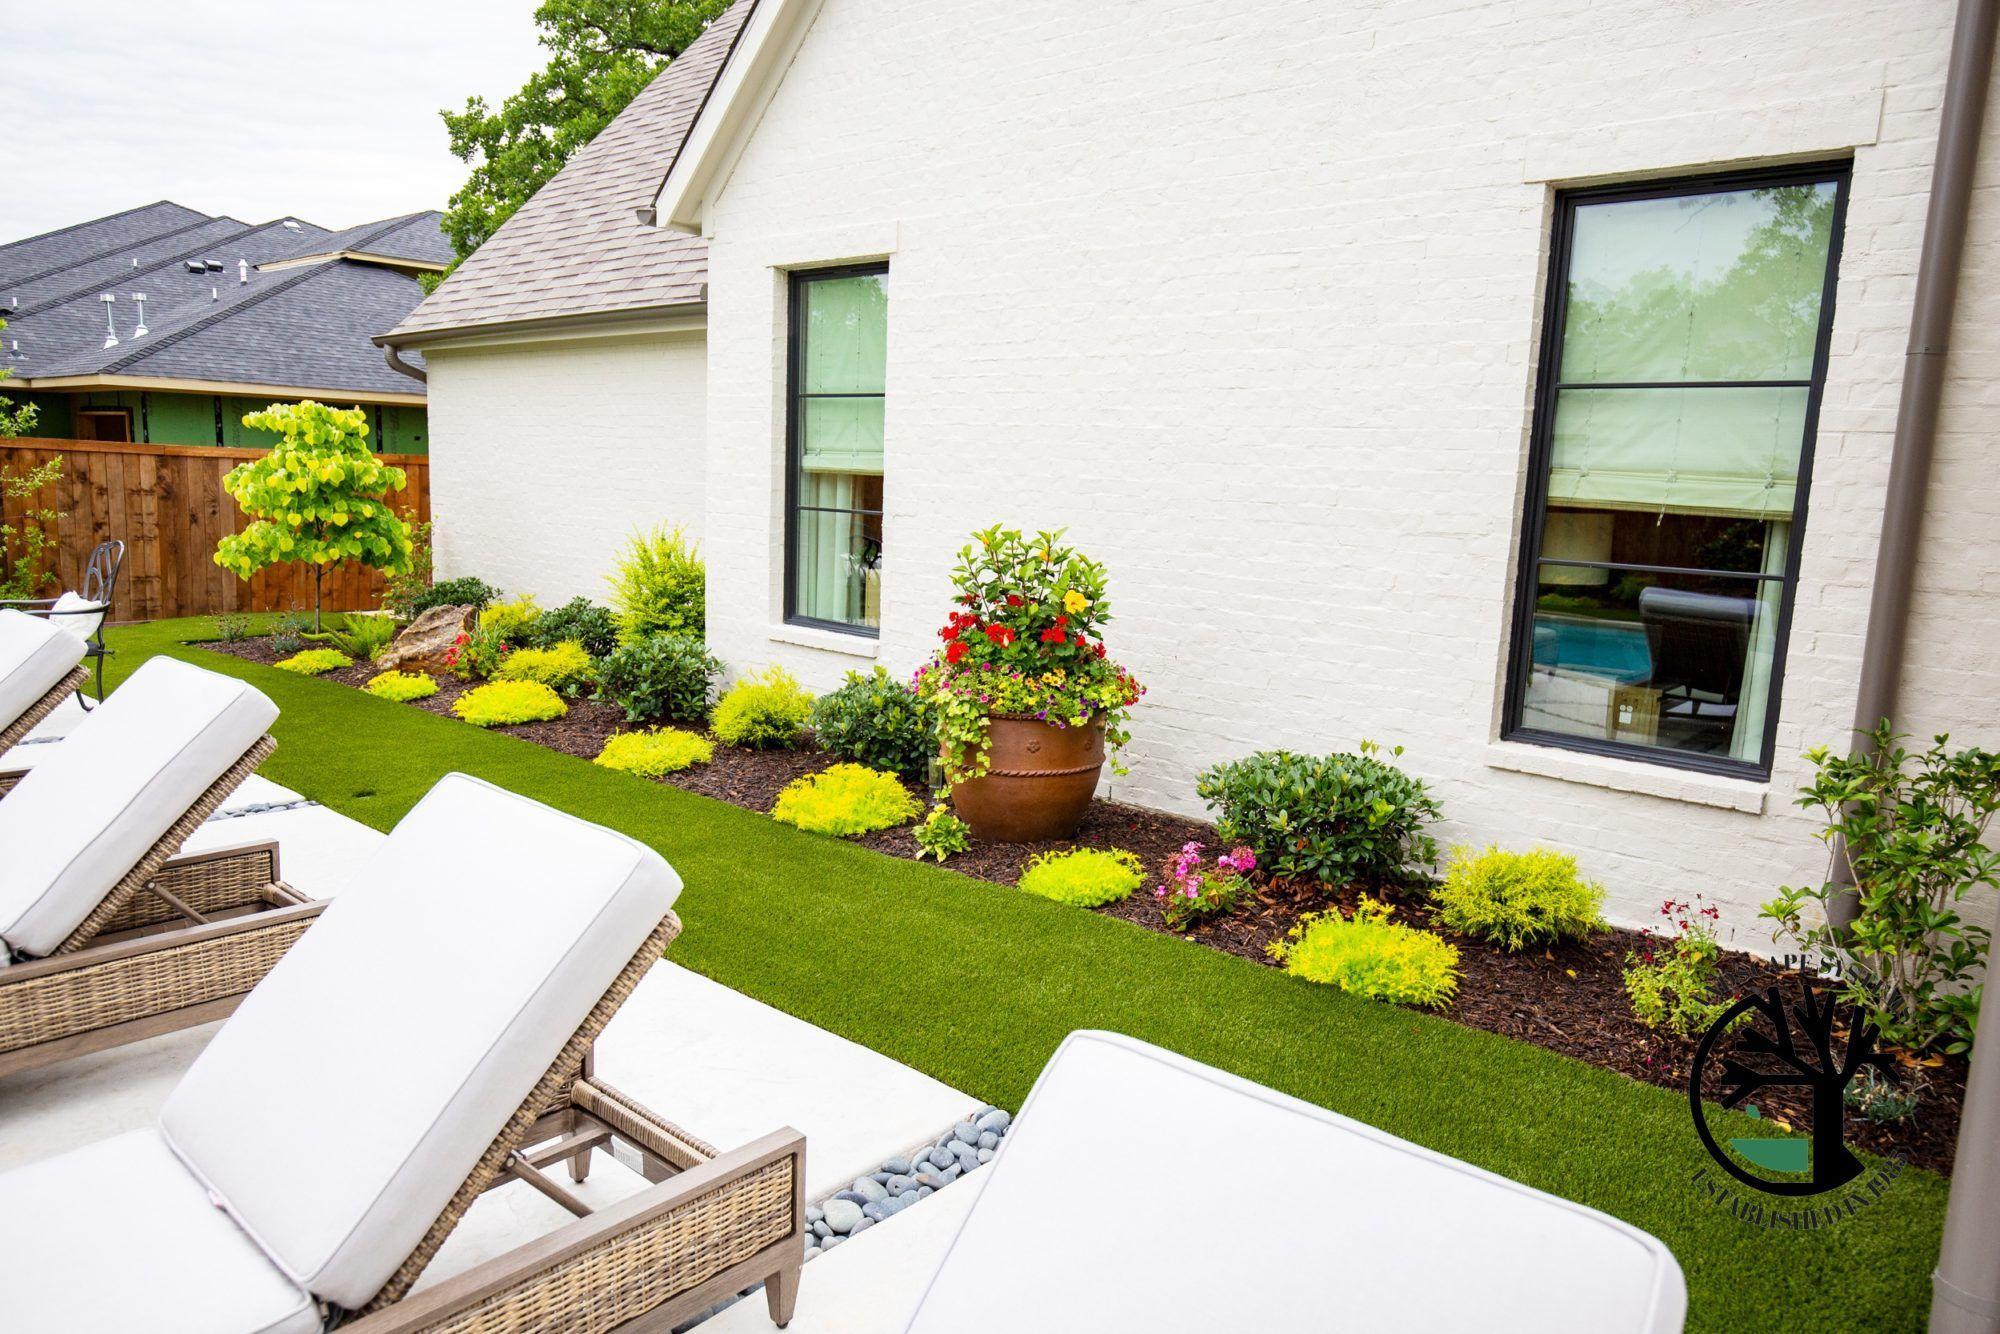 Modern Back Yard Install Colleyville Texas Landscape Designer Landscape Systems Garden Center In 2020 Landscape Design Planting Flowers Garden Center